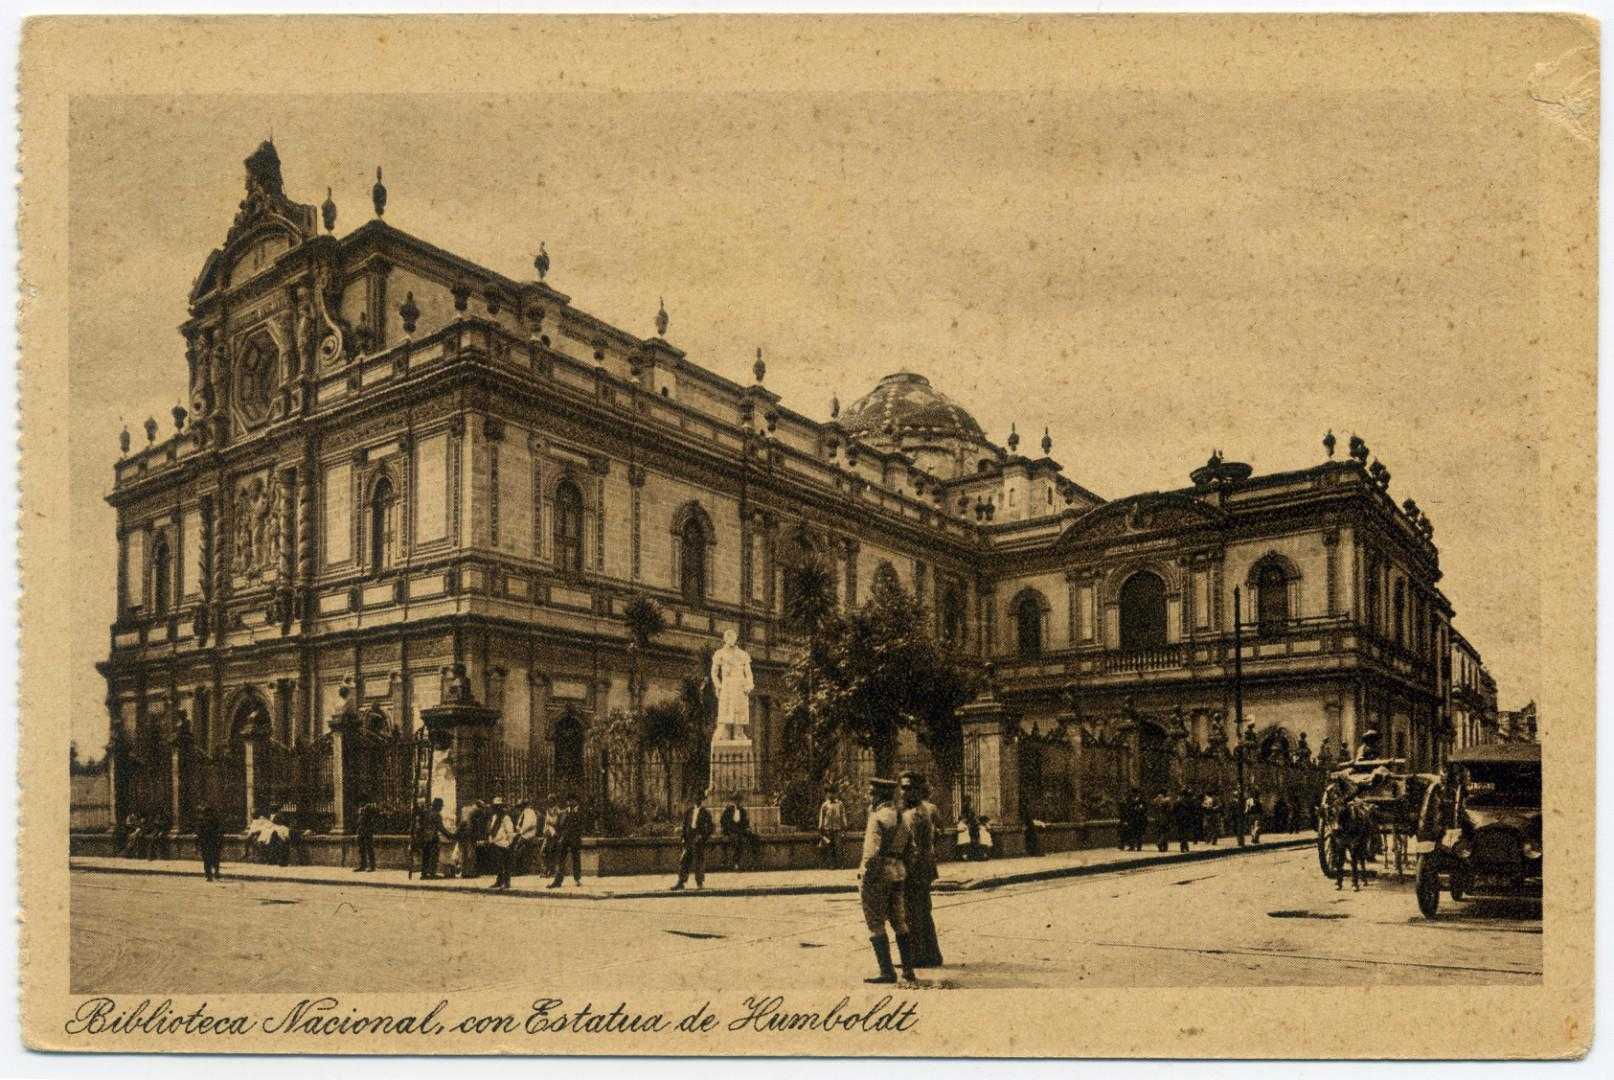 Mexiko-Stadt: Nationalbibliothek